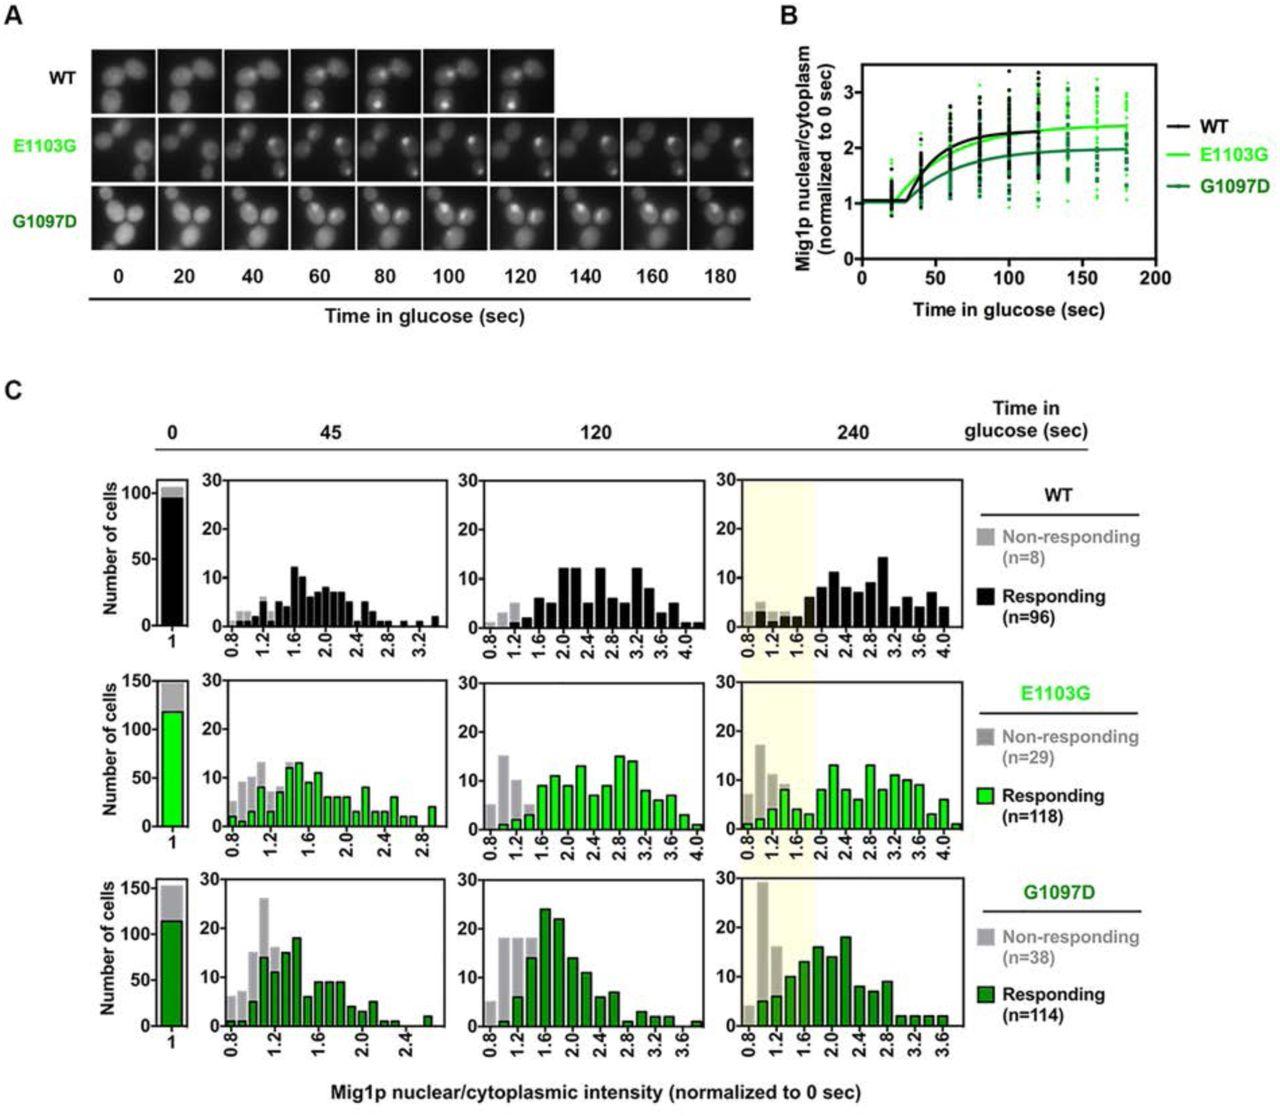 Effects of Pol II catalytic mutants on in vivo elongation rate